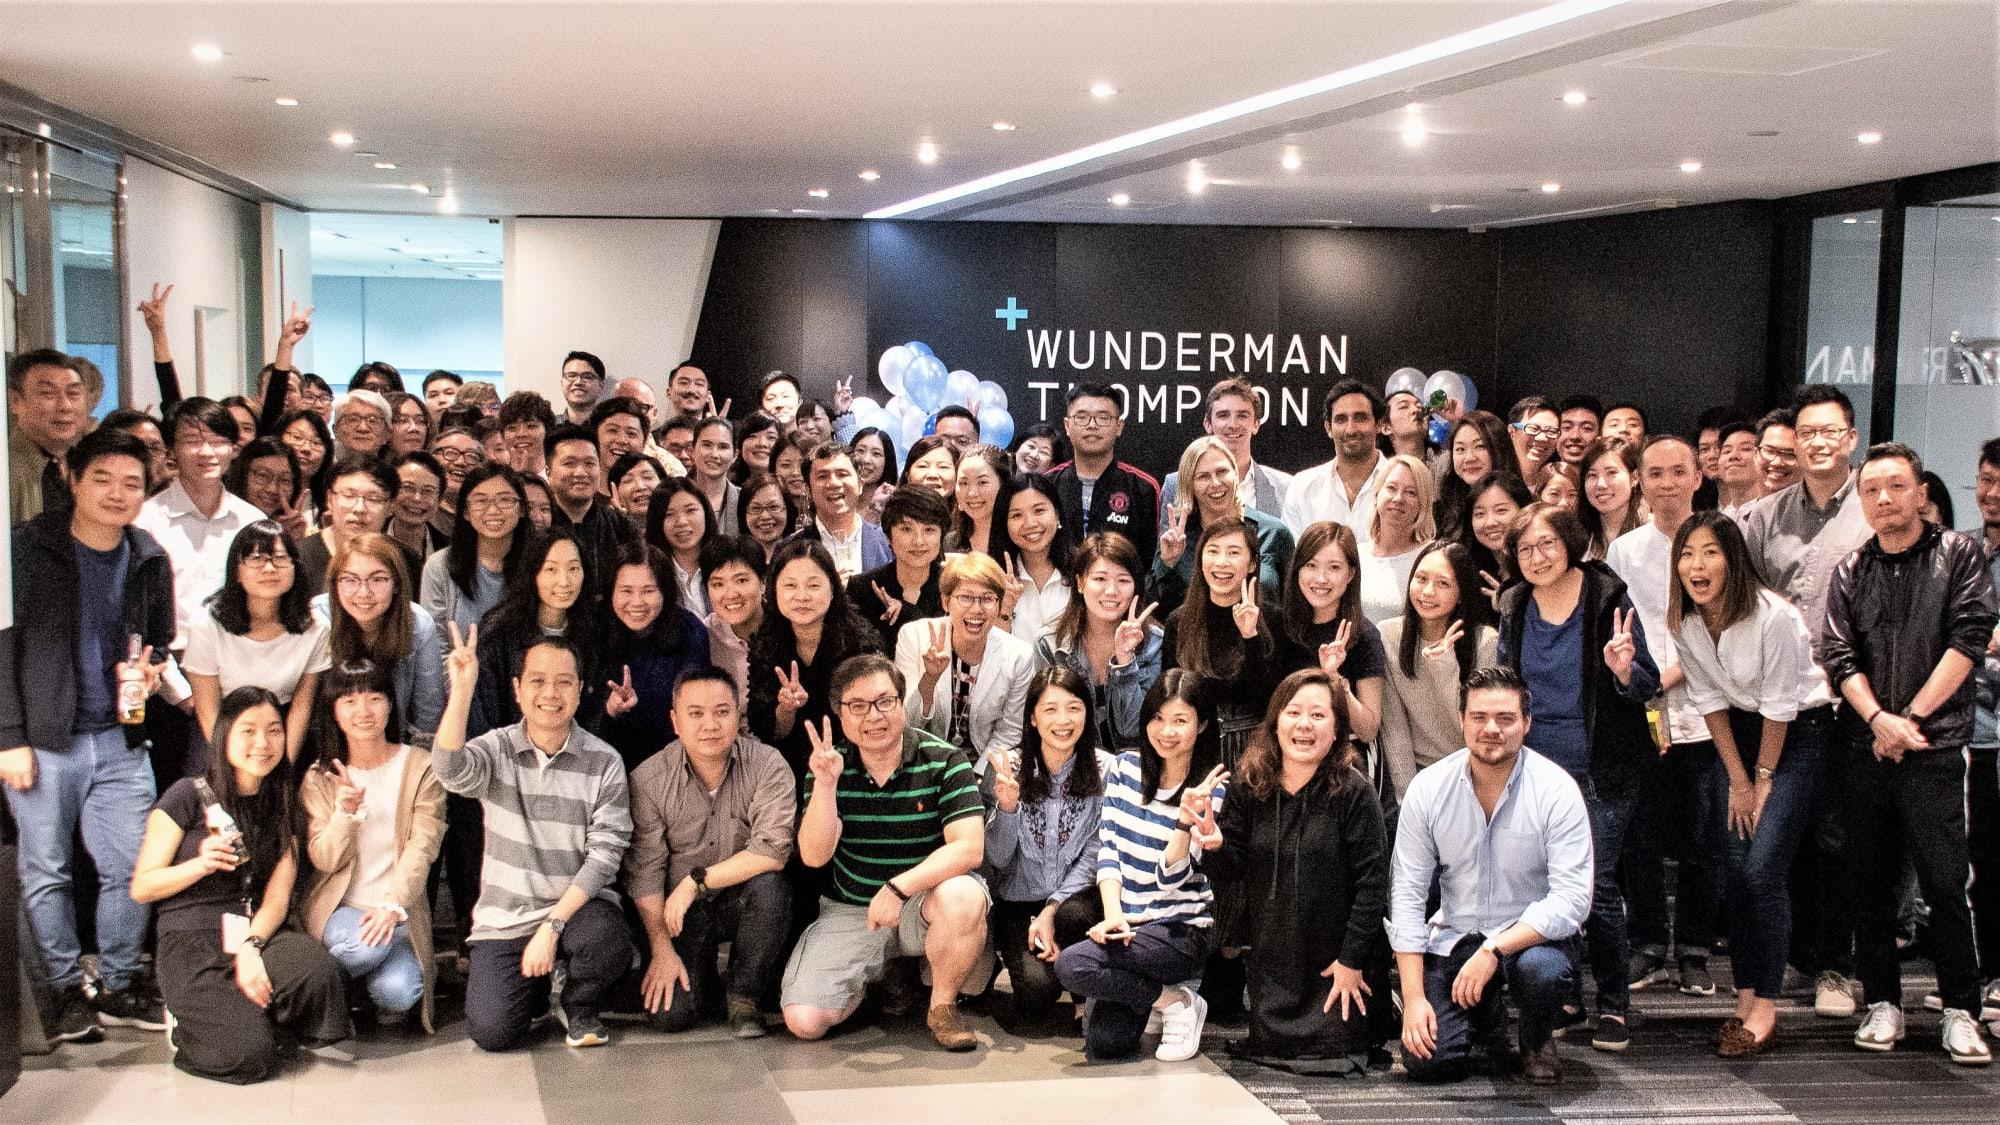 HK WT office image 1